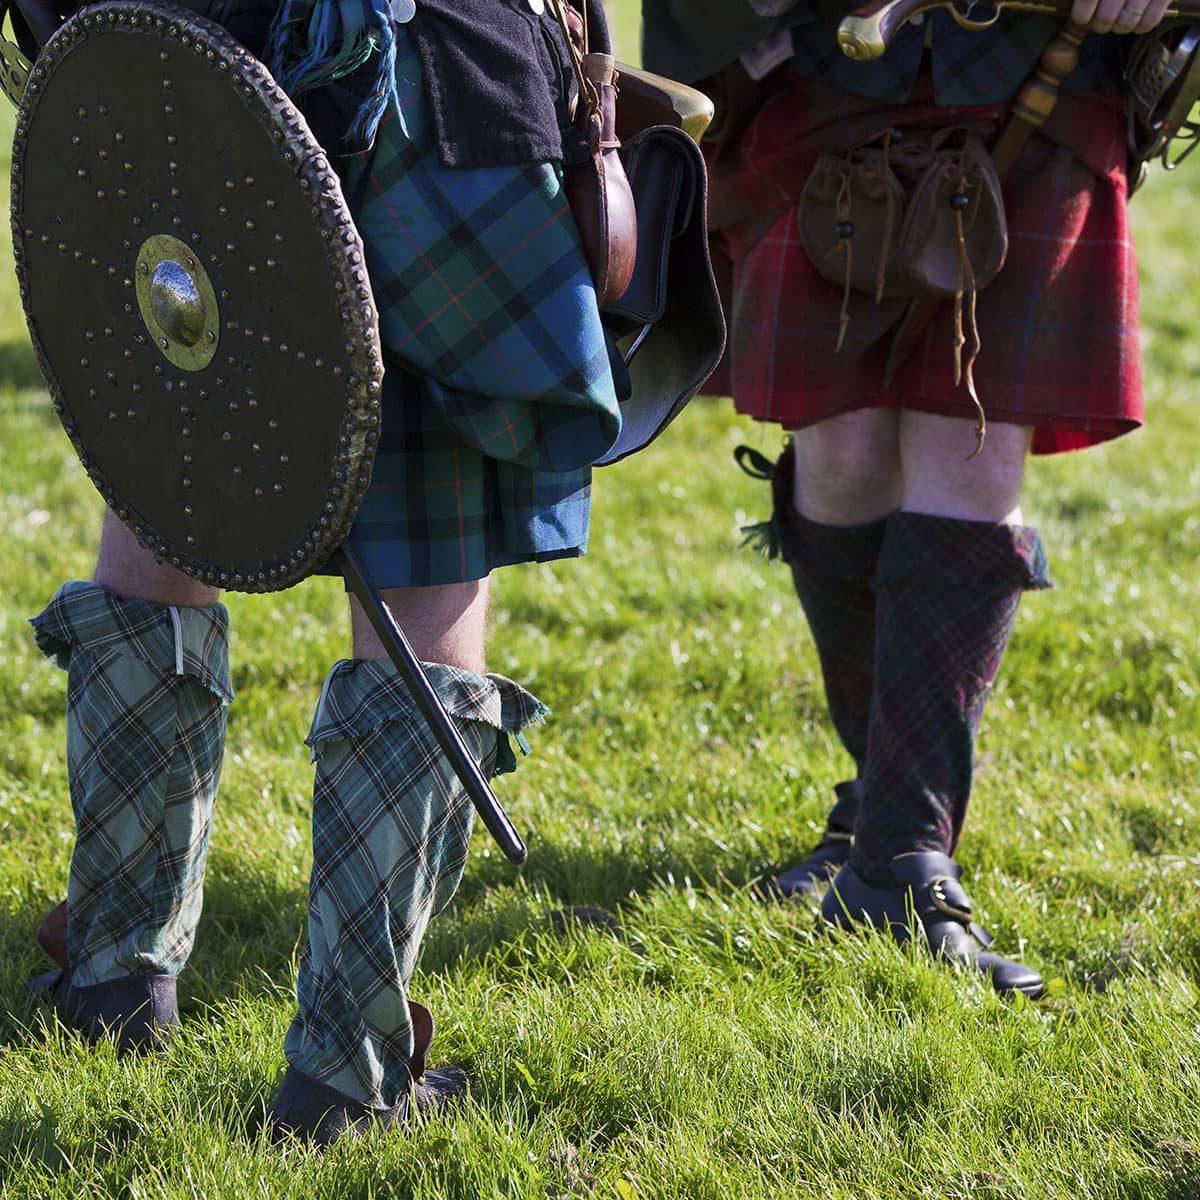 scottish-battle-dress-kilt